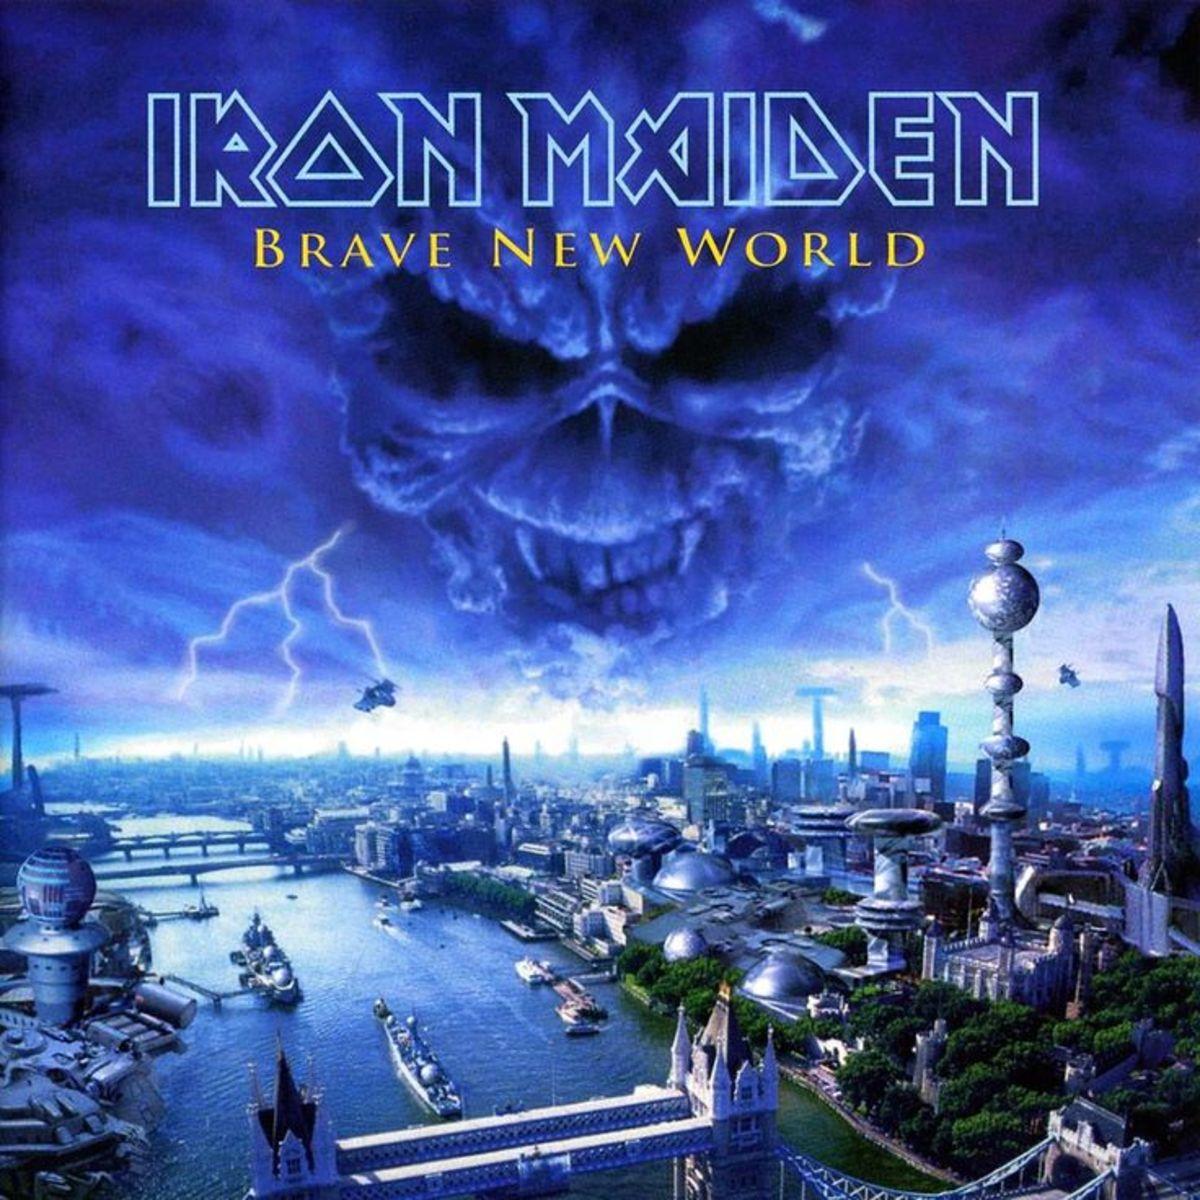 """Brave New World"" album cover (art by Derek Riggs)"